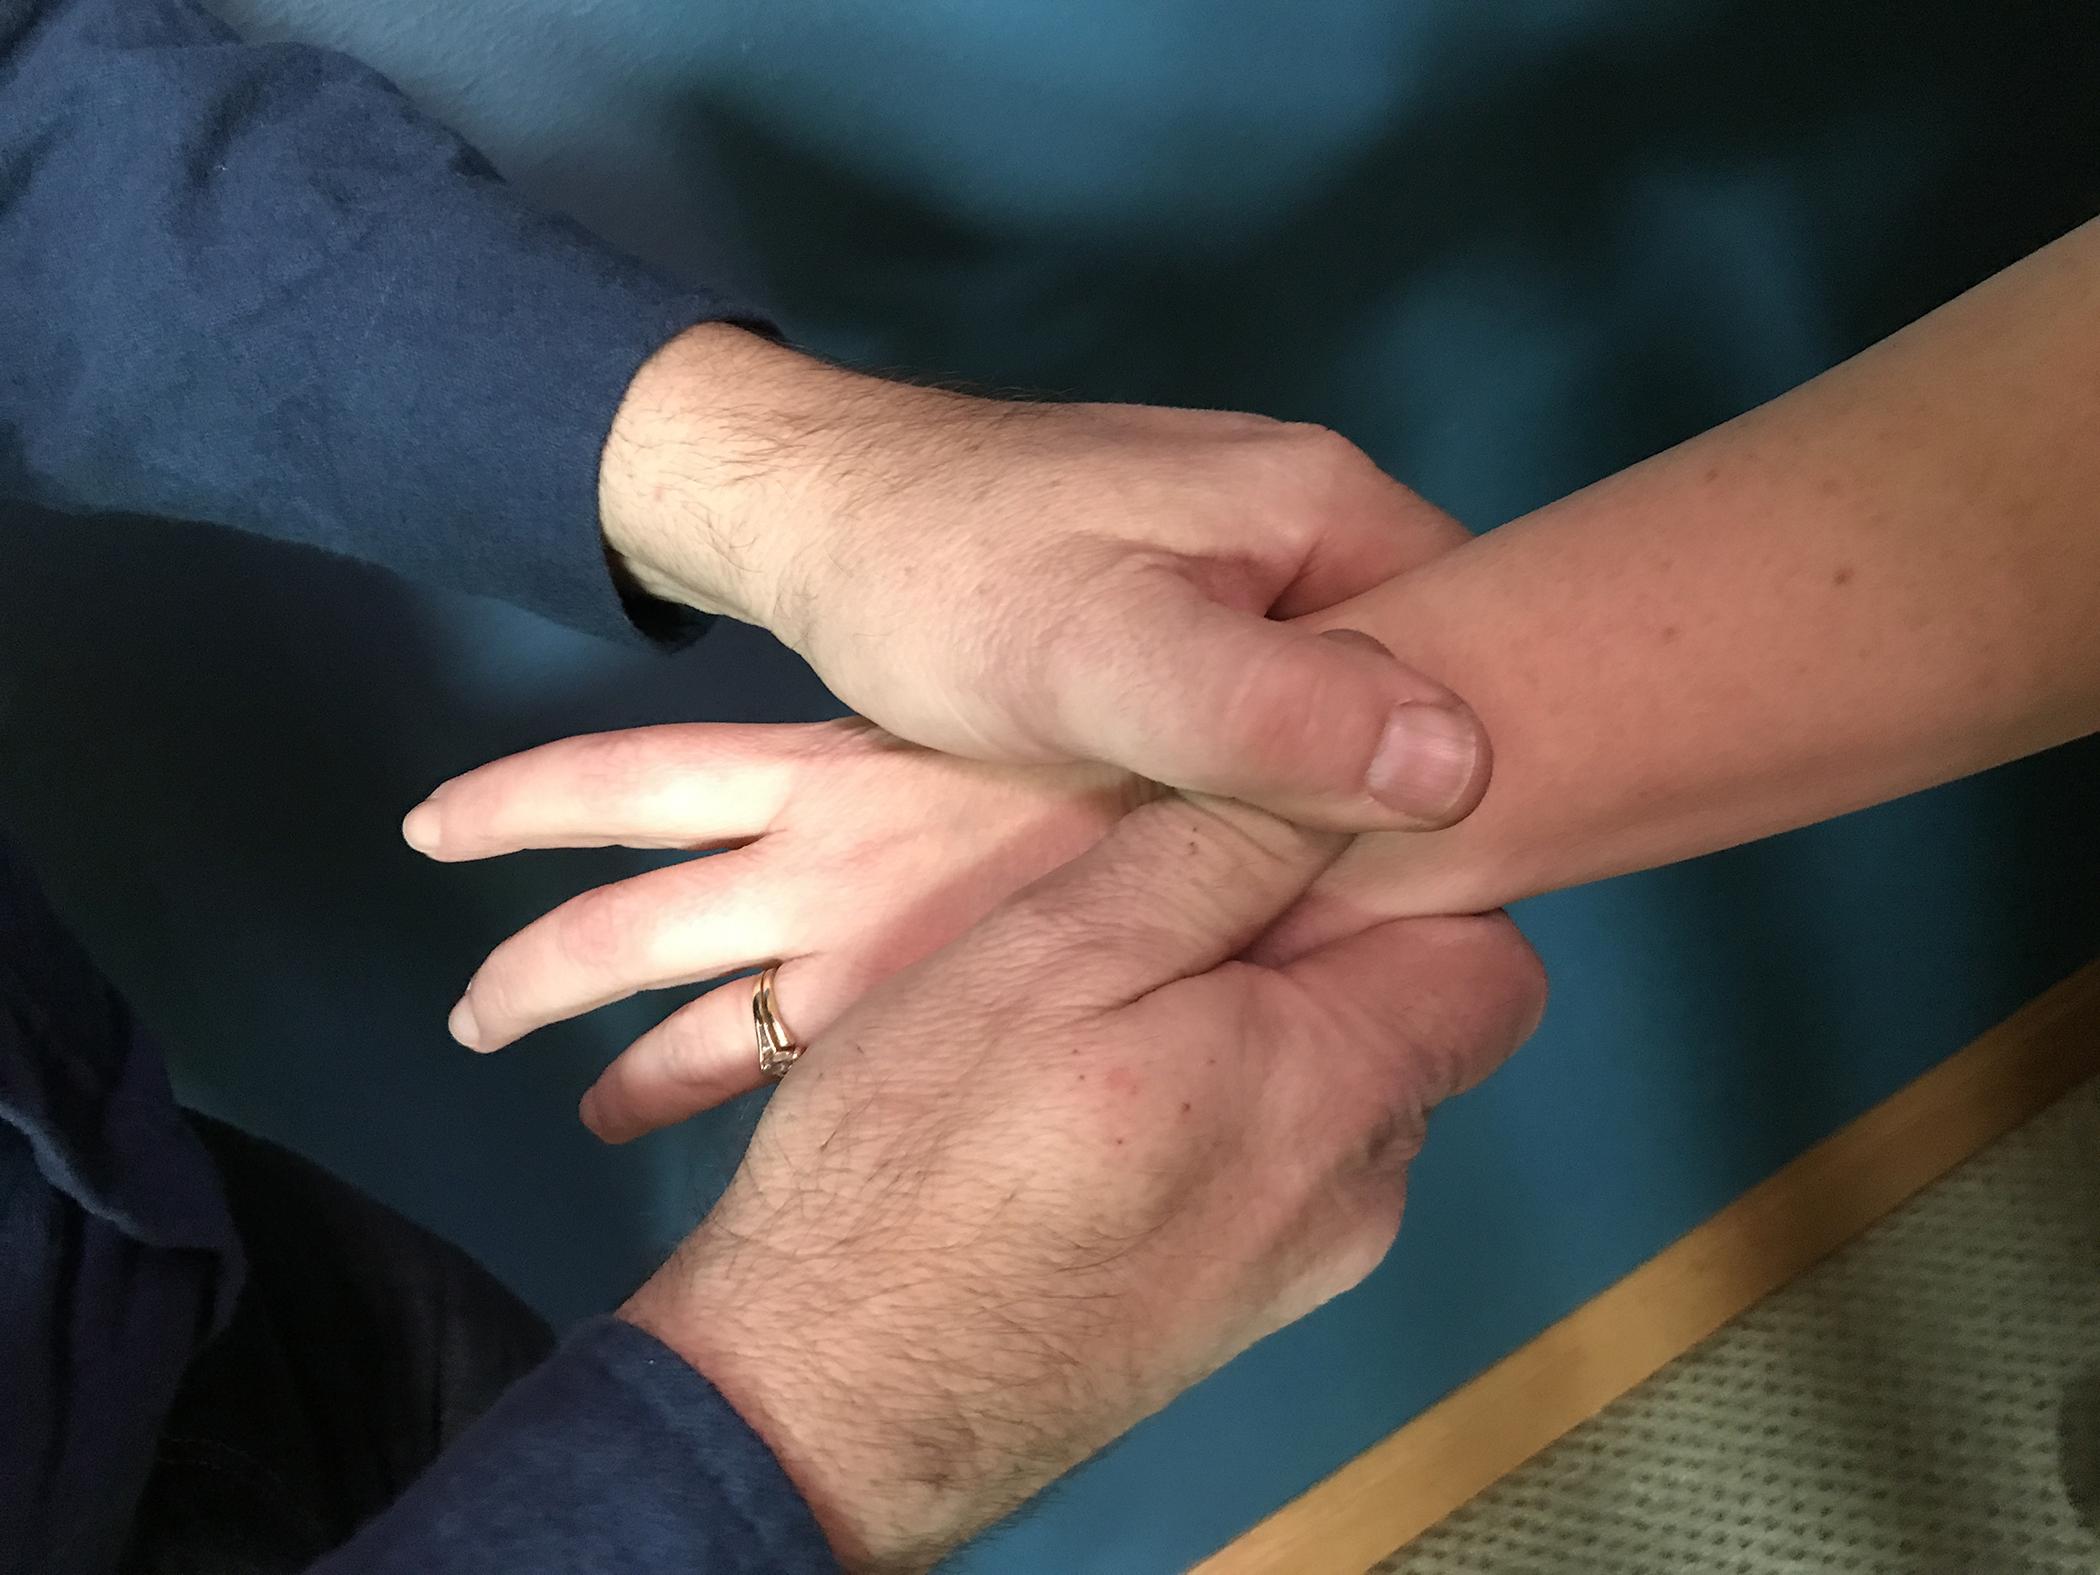 chiropractor adjusts wrist